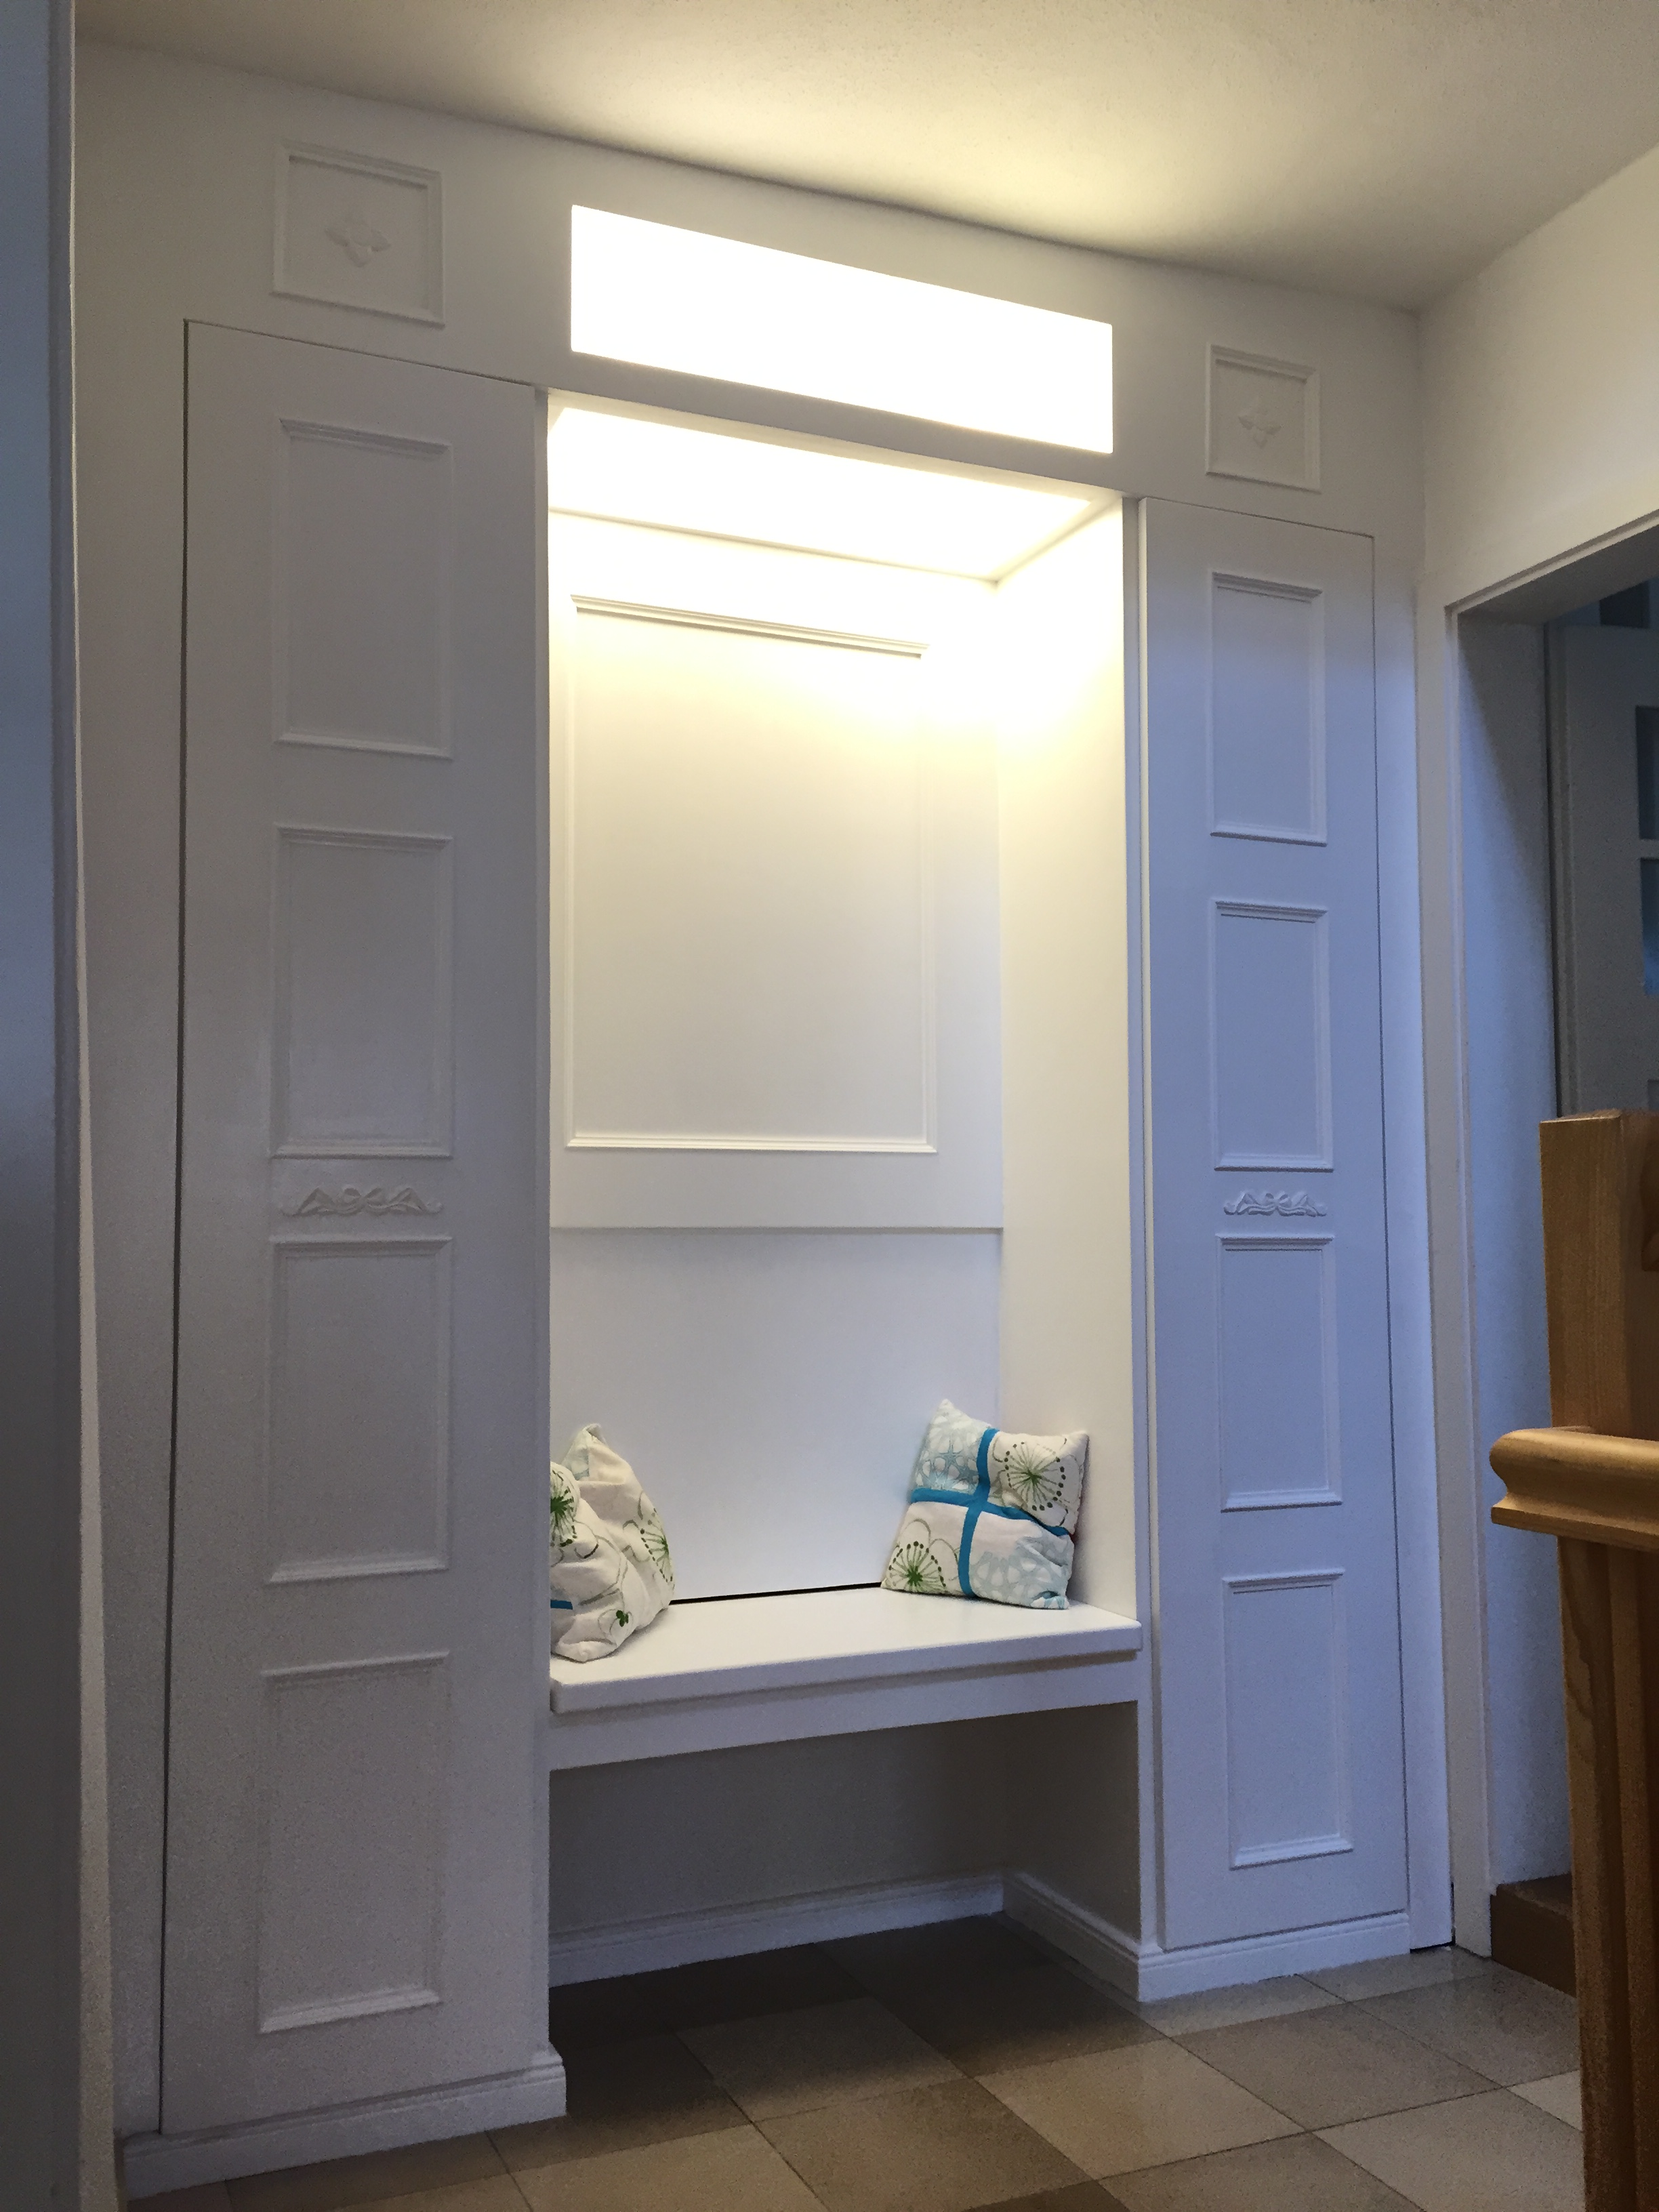 Wandschrank selber bauen simple with wandschrank selber bauen full size of haus renovierung - Wandschrank selber bauen ...